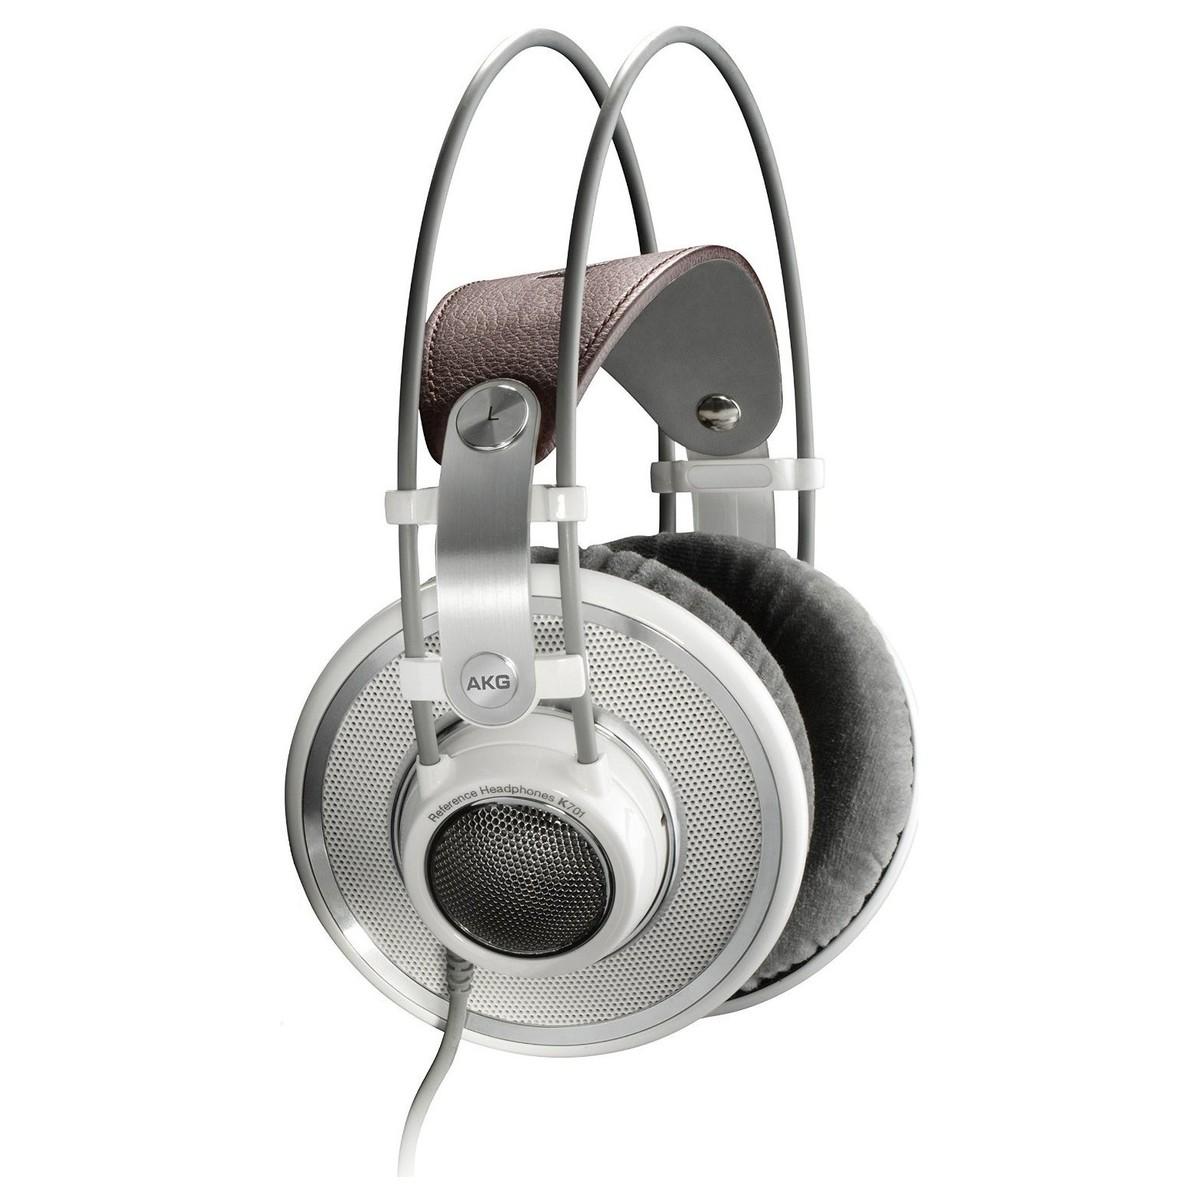 Wireless bluetooth headphones accessories - akg headphones bluetooth wireless